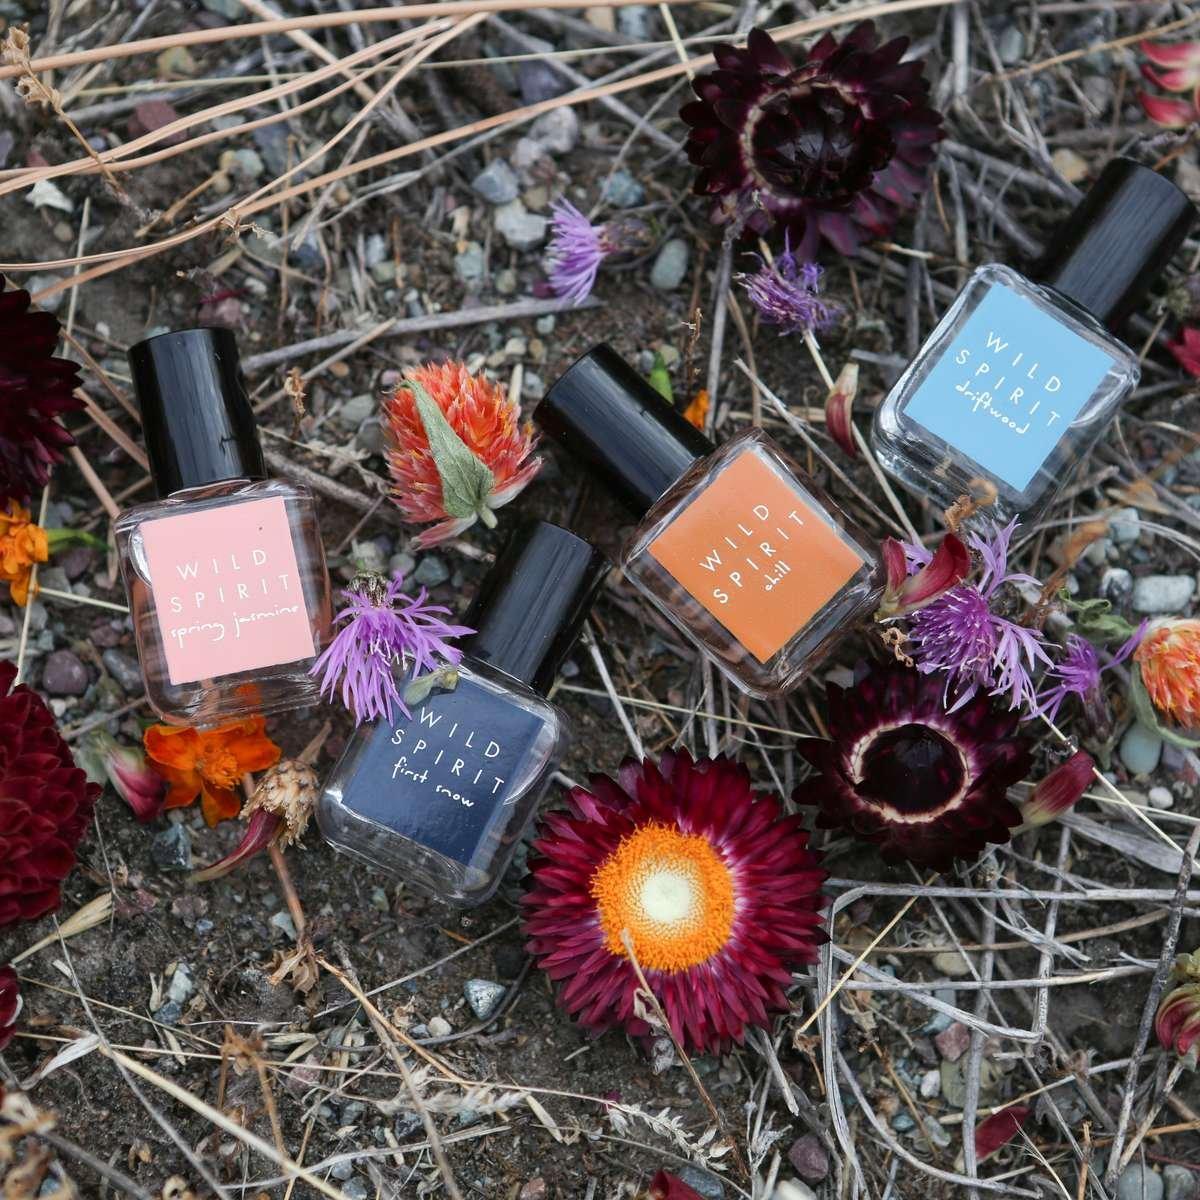 Wild Spirit Fragrances Discovery Set